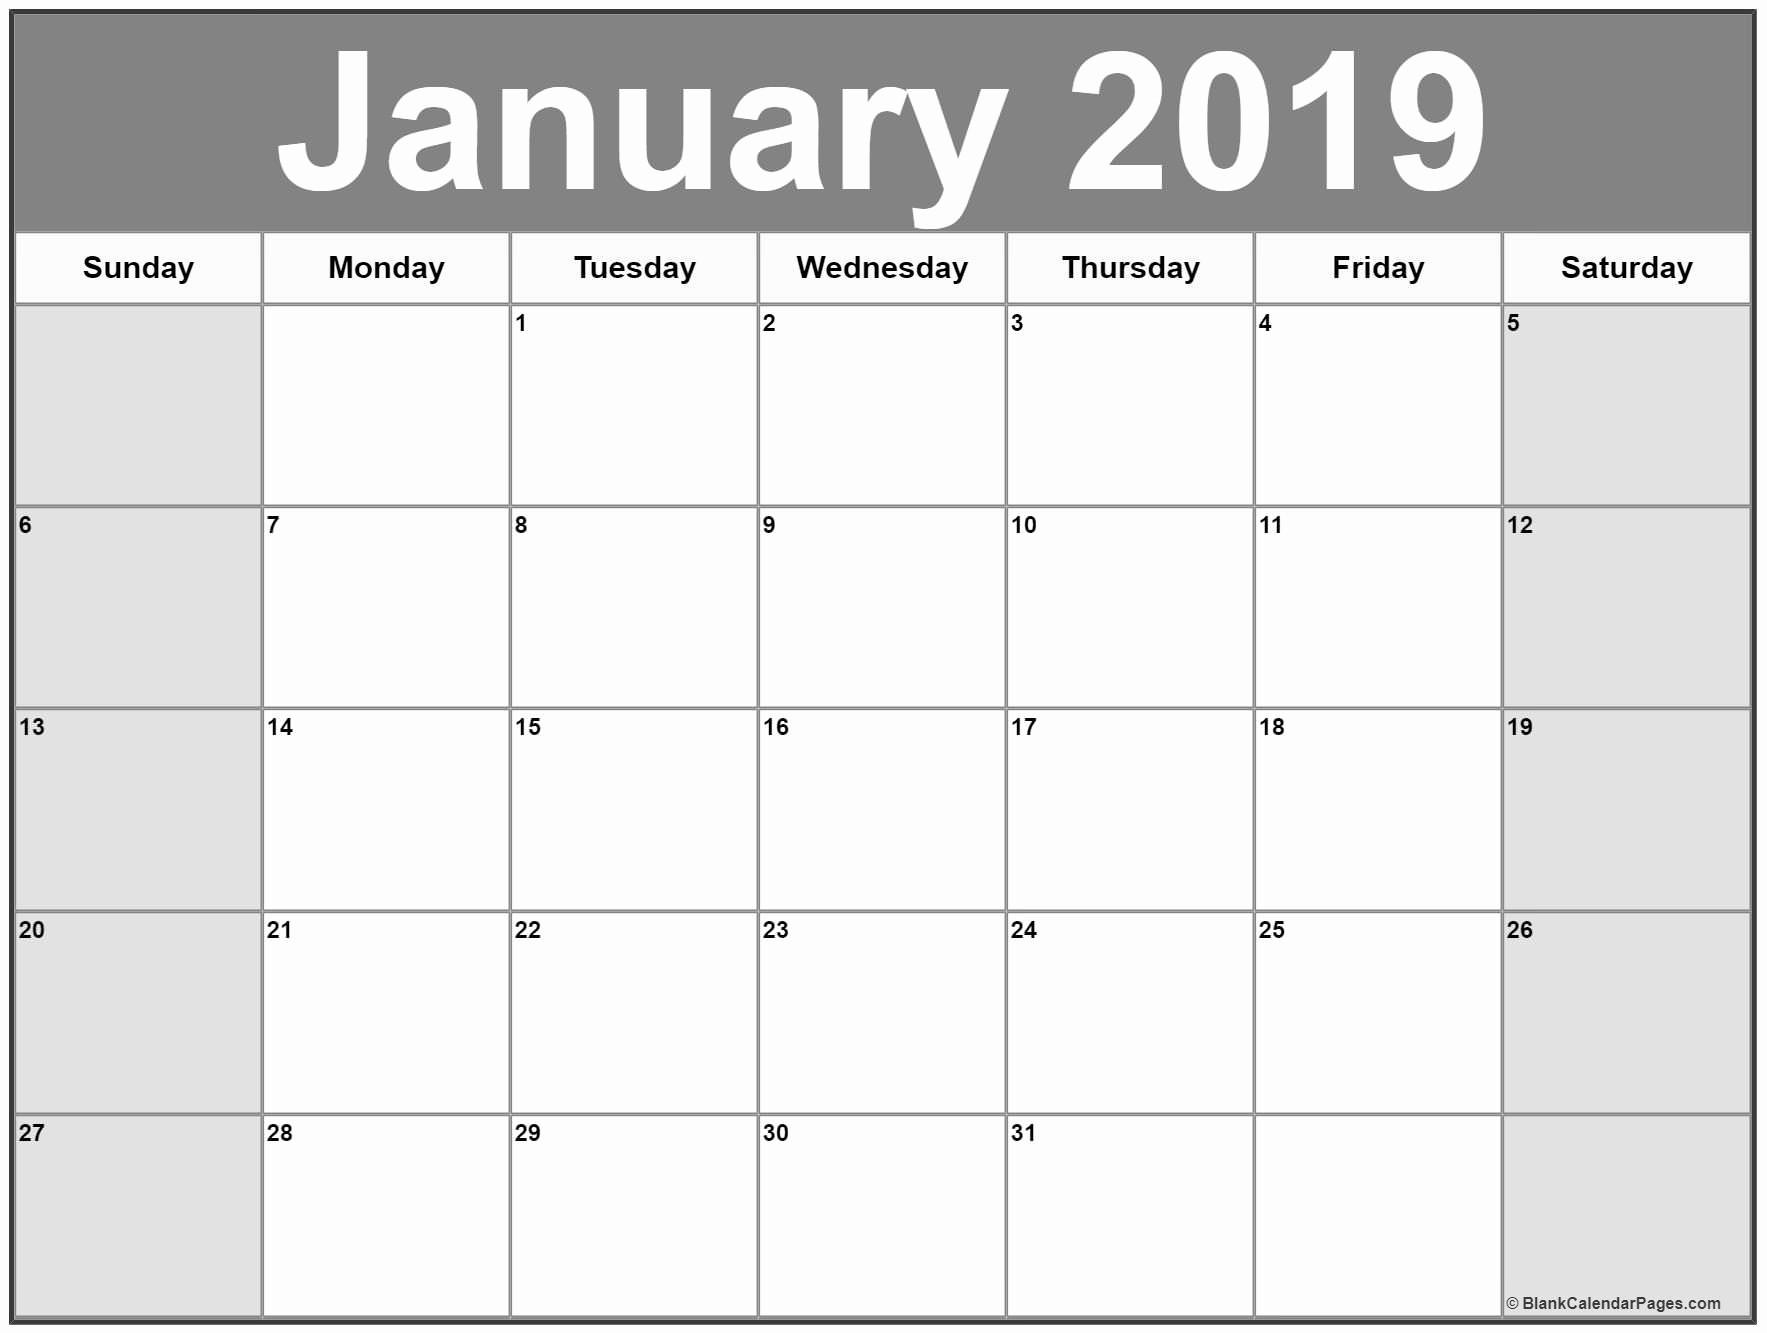 Blank January 2019 Calendar Template Inspirational January 2019 Calendar